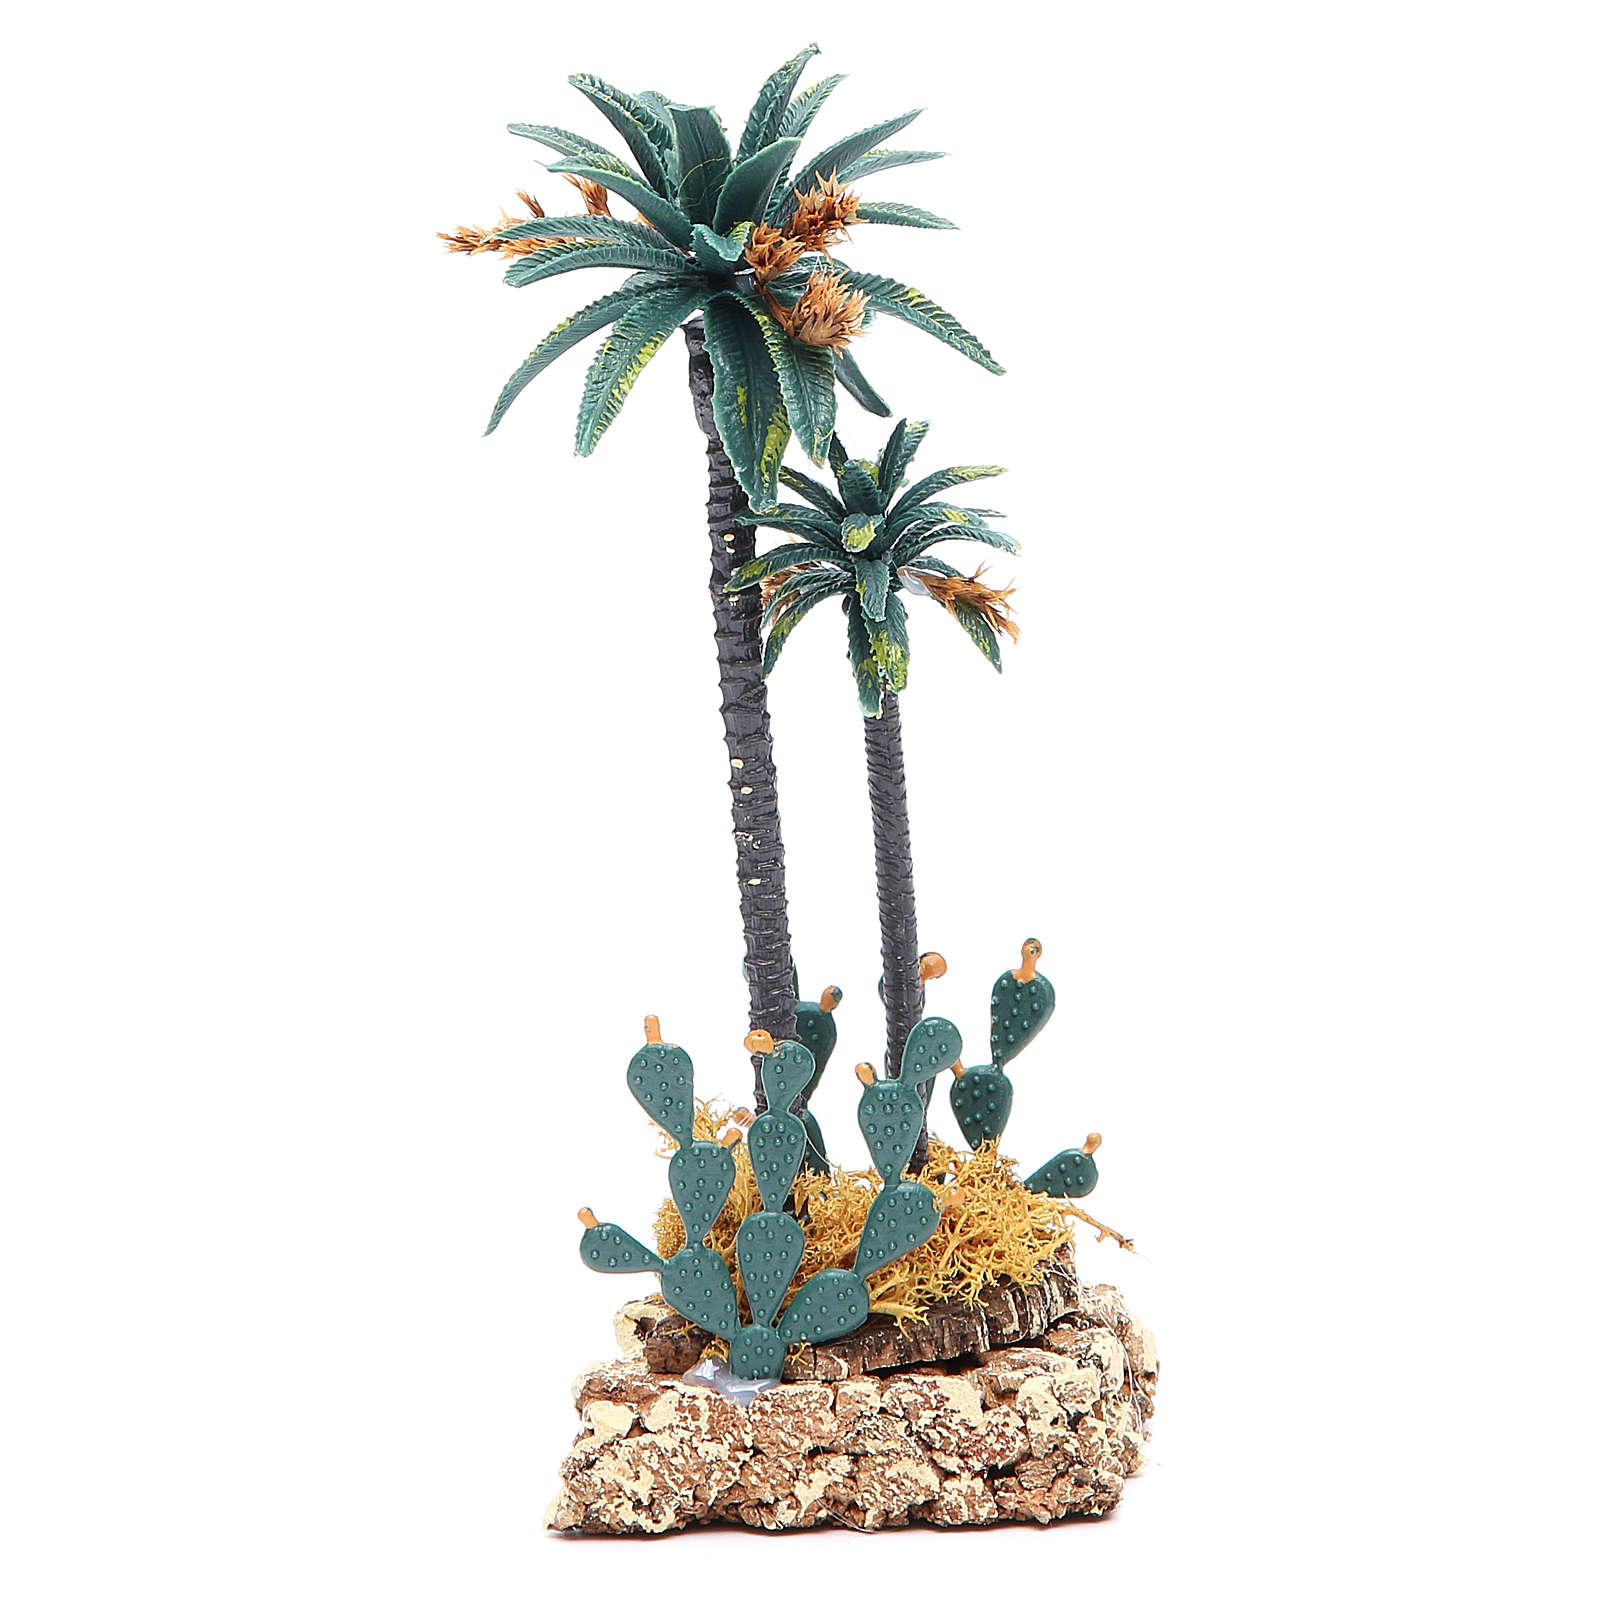 Palma y cacto h. 20 cm pvc 4